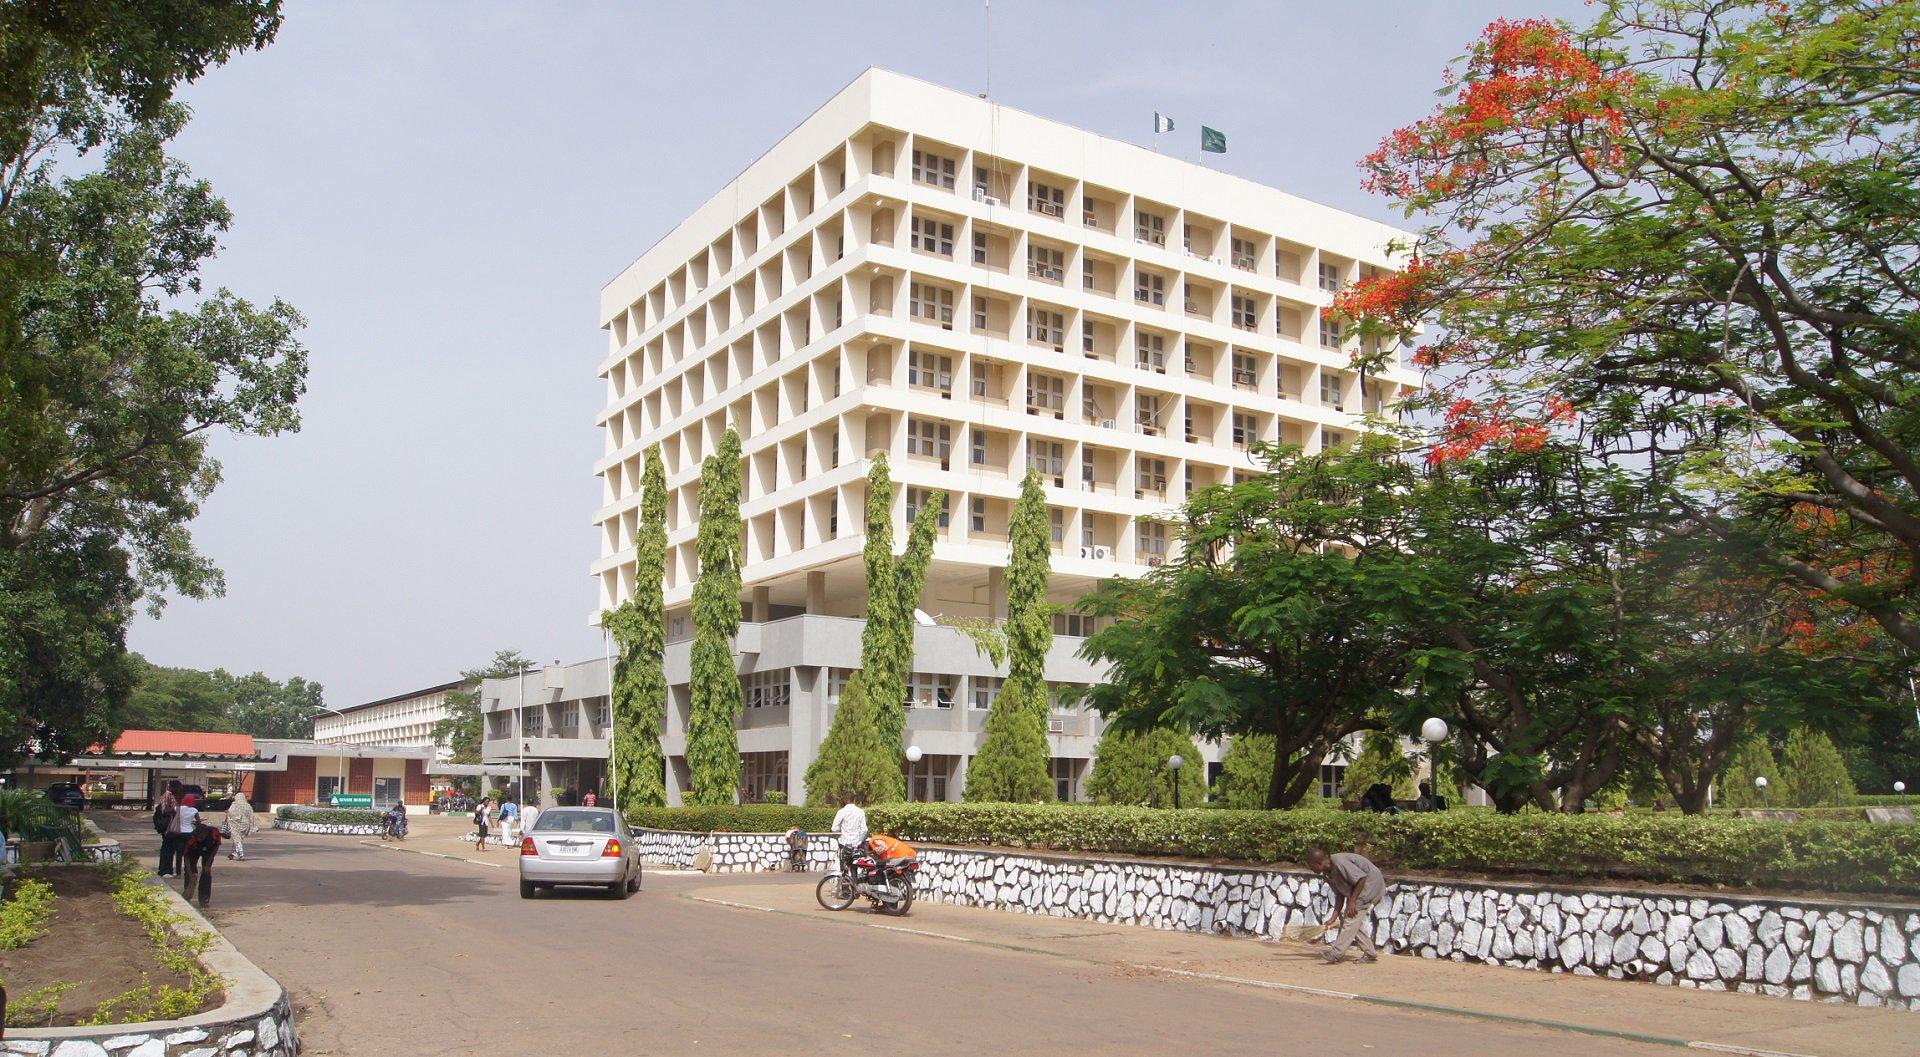 Ahmadu Bello University